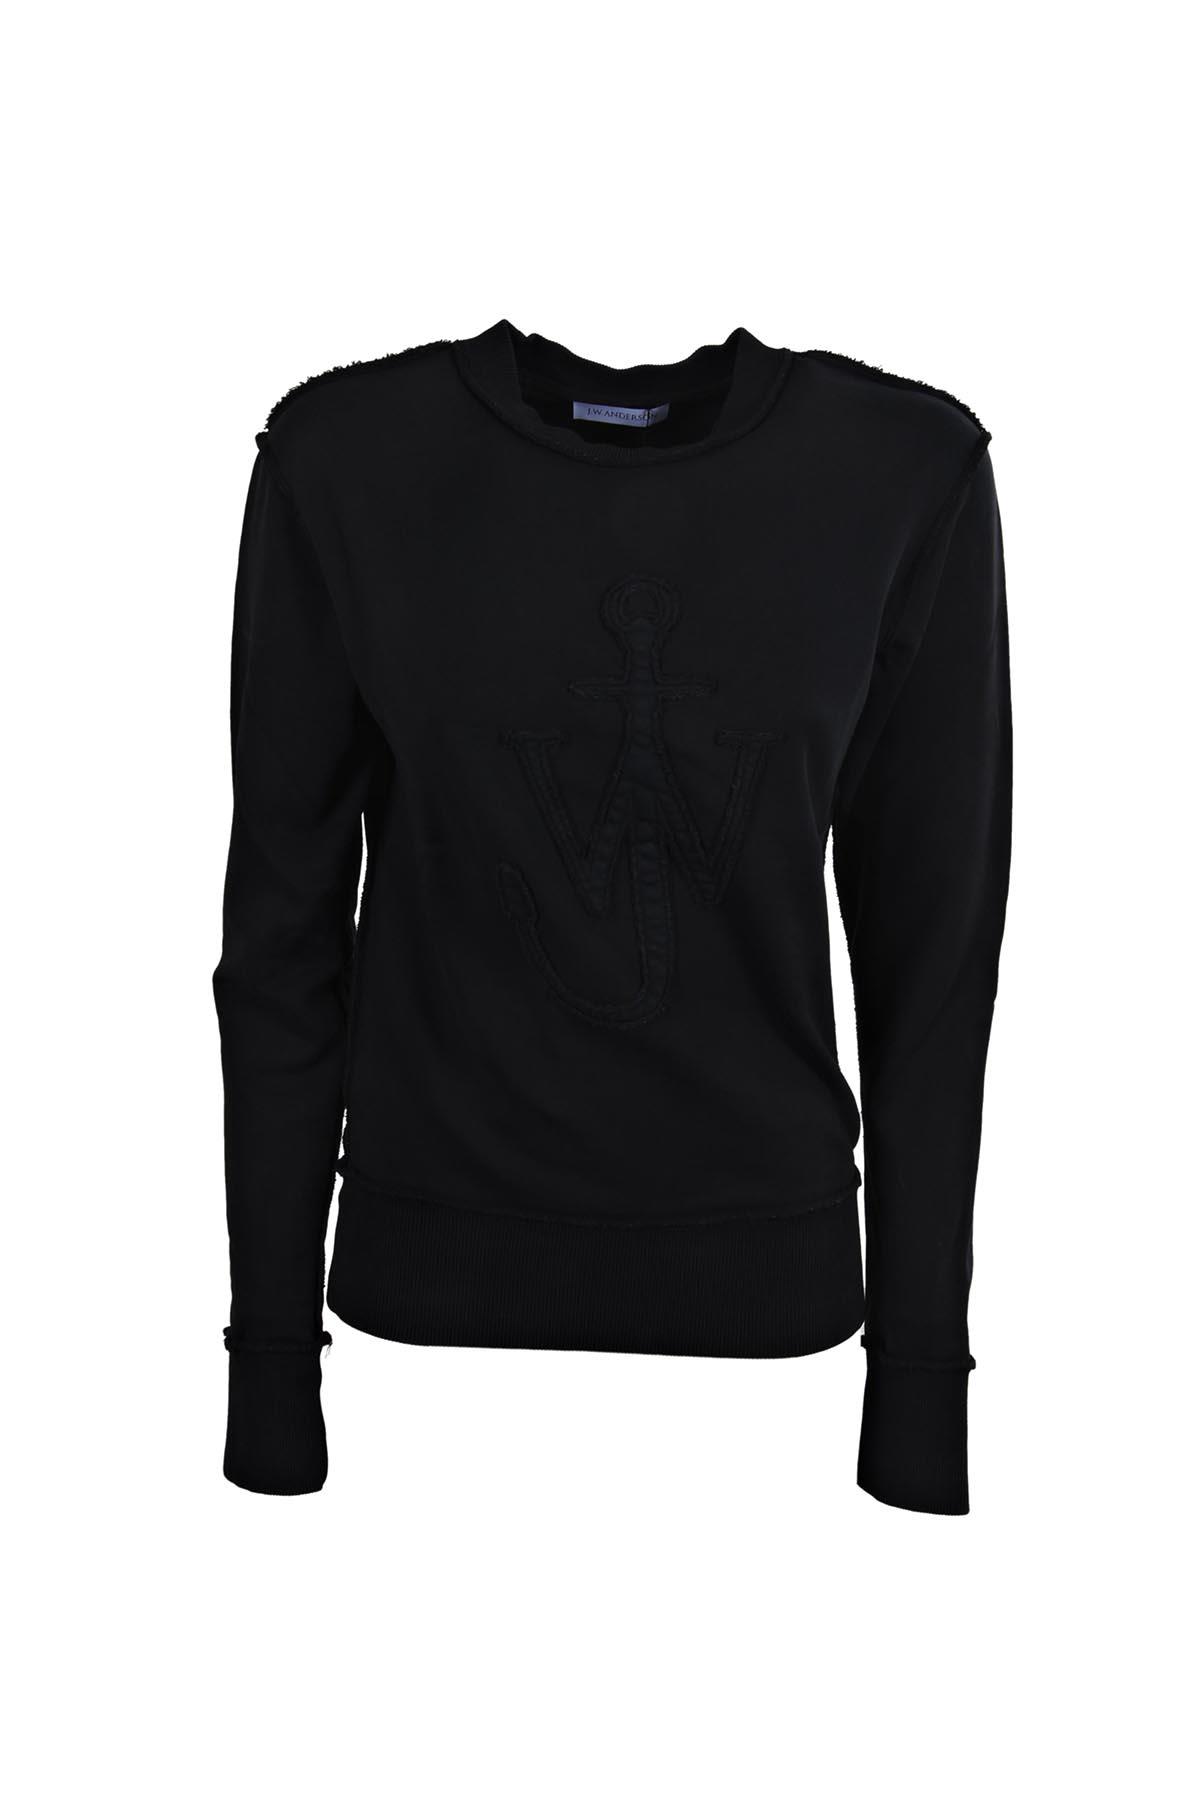 J.W. Anderson Logo Sweater